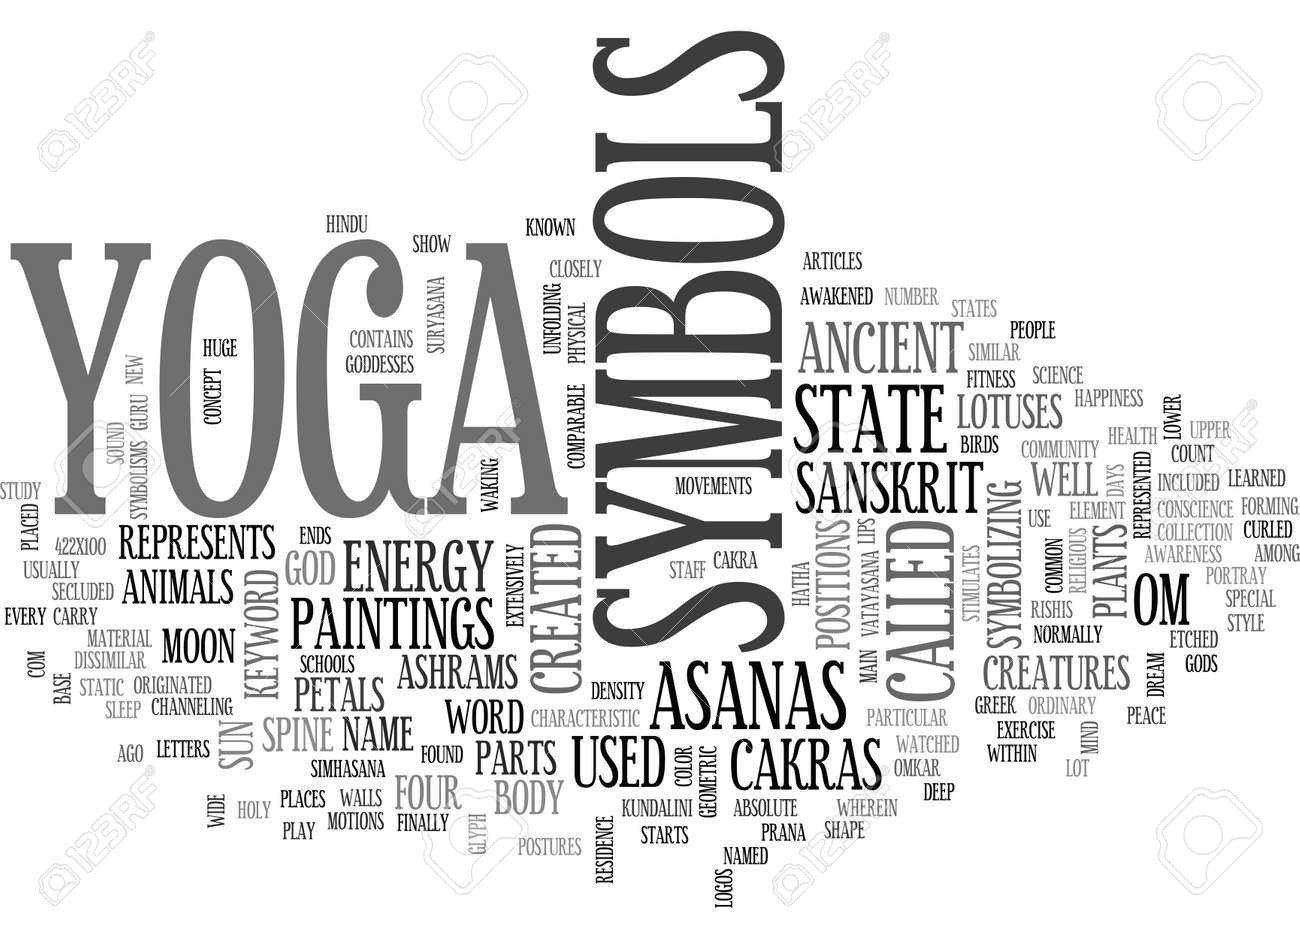 Yoga symbols text word cloud concept royalty free cliparts yoga symbols text word cloud concept stock vector 79647460 biocorpaavc Gallery